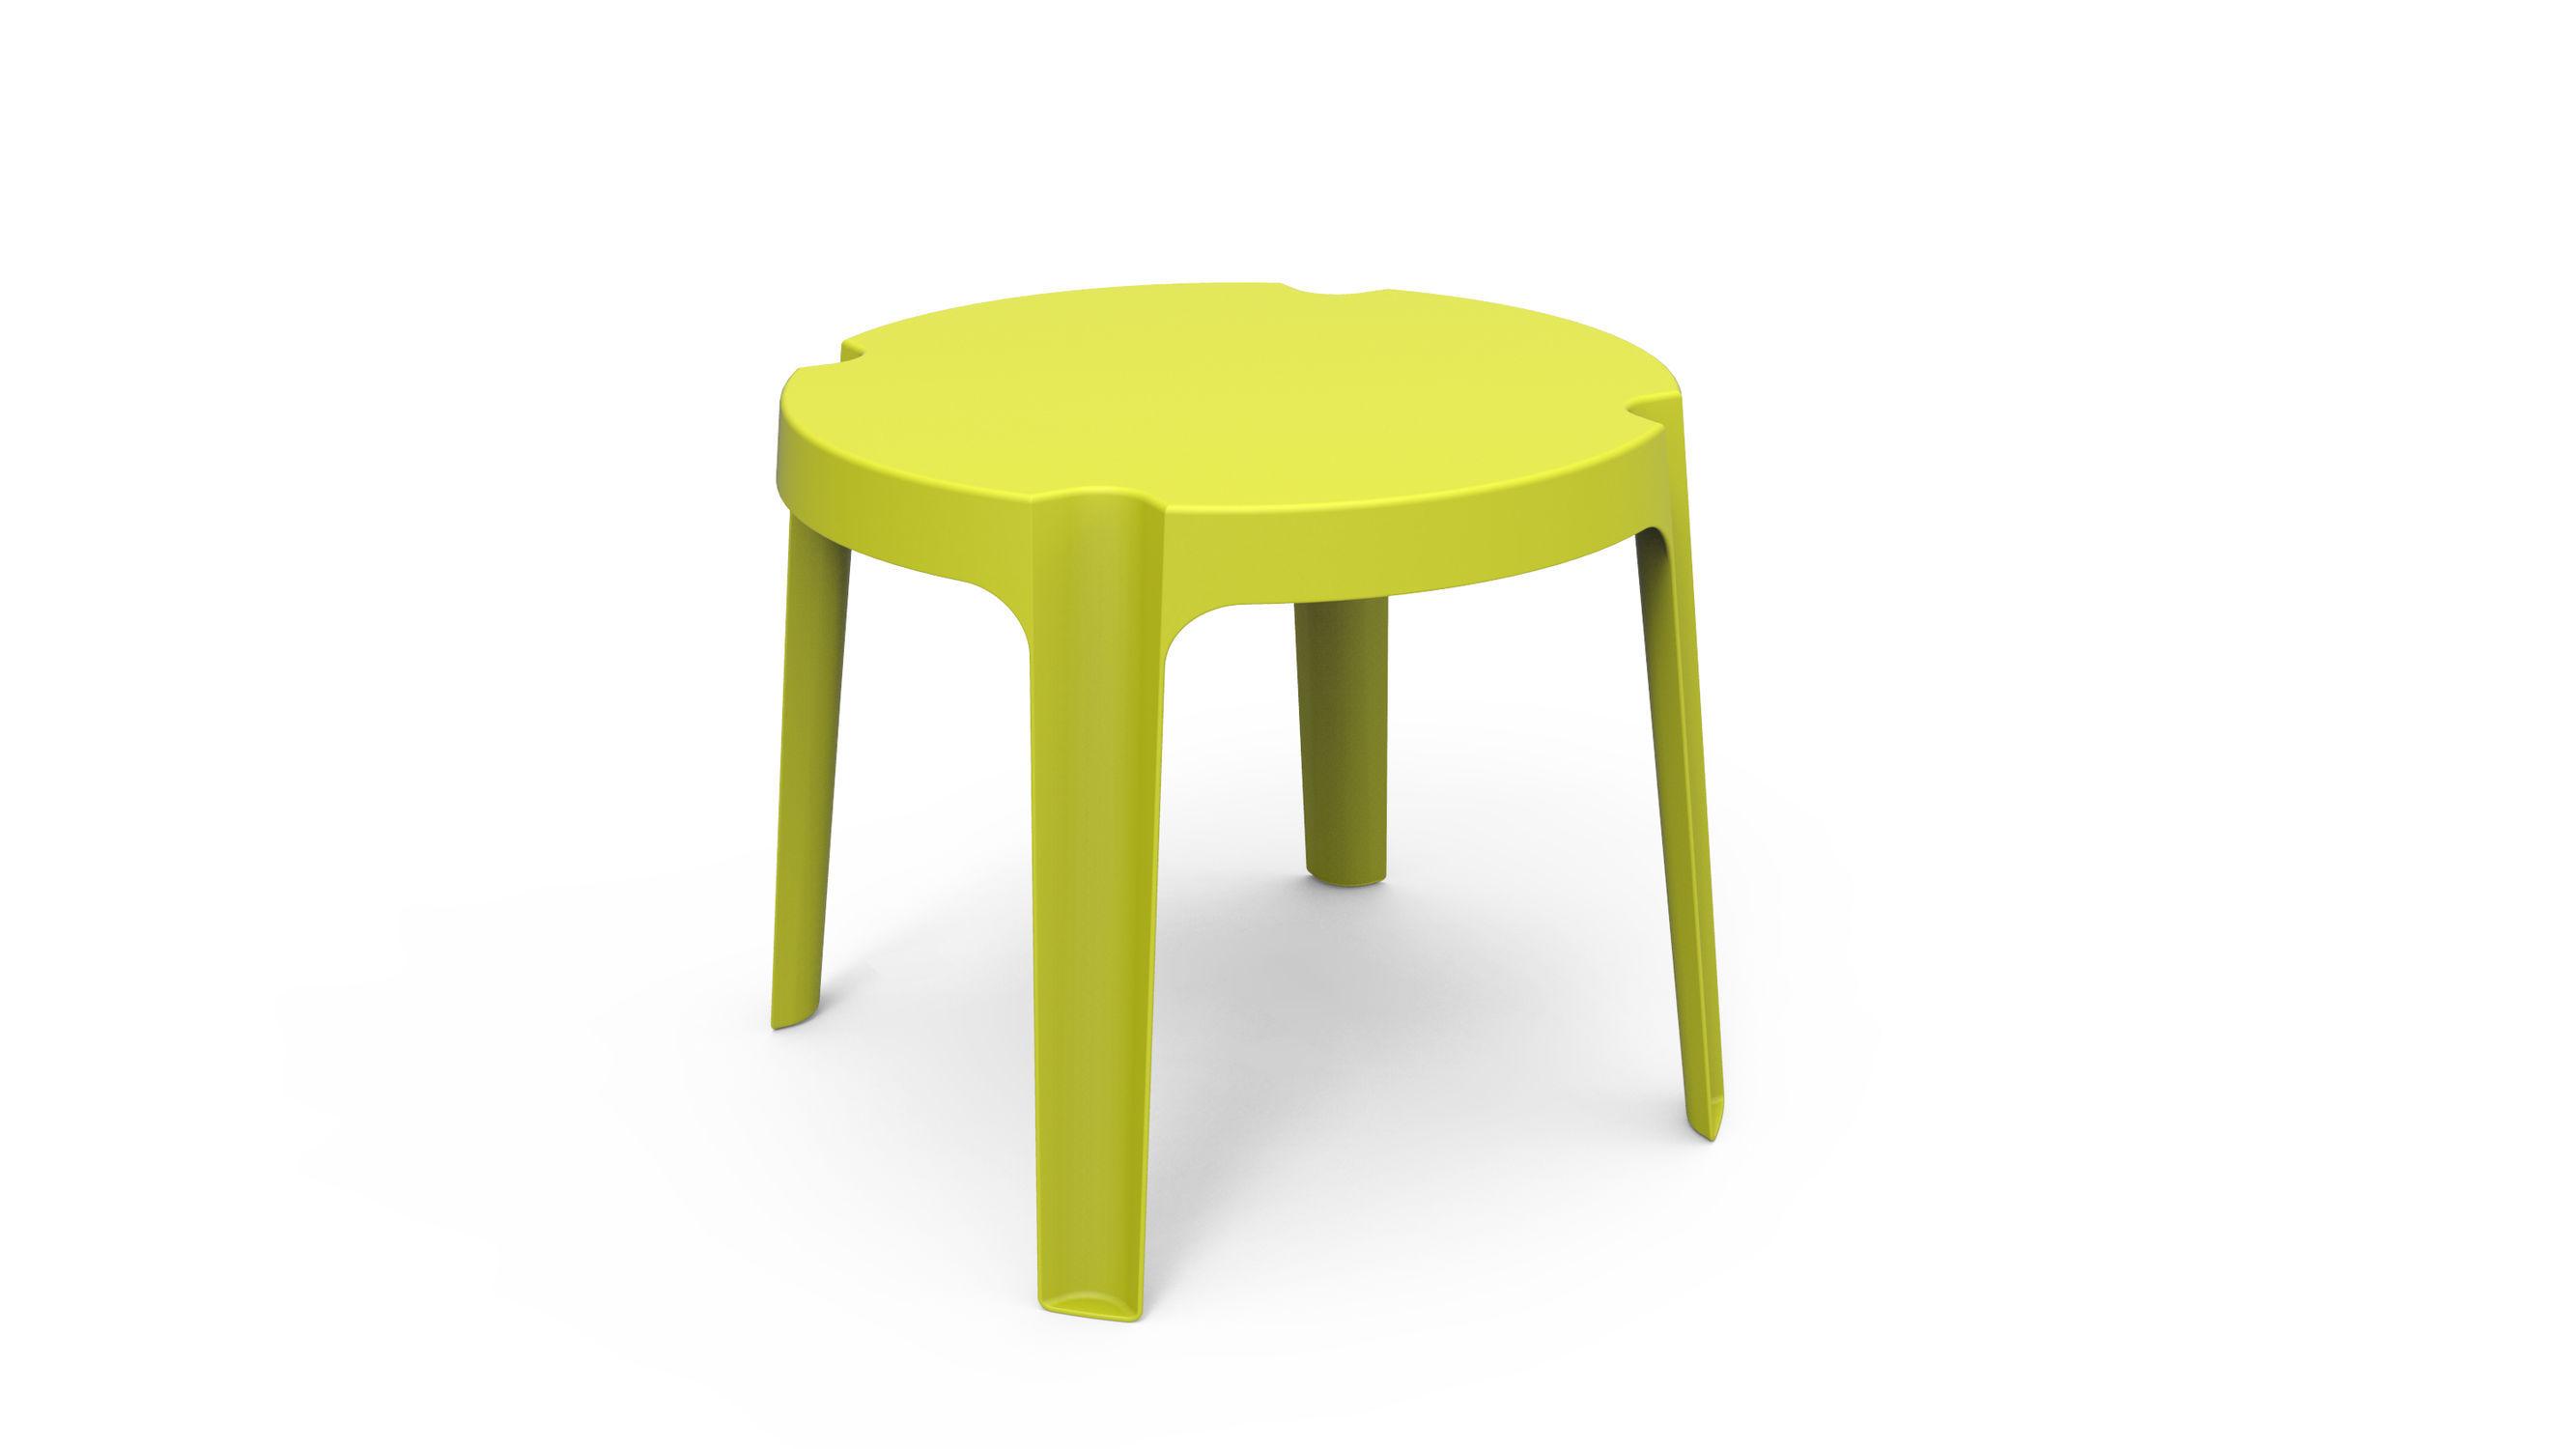 Sgabello moderno in plastica verde rita by joan gaspar